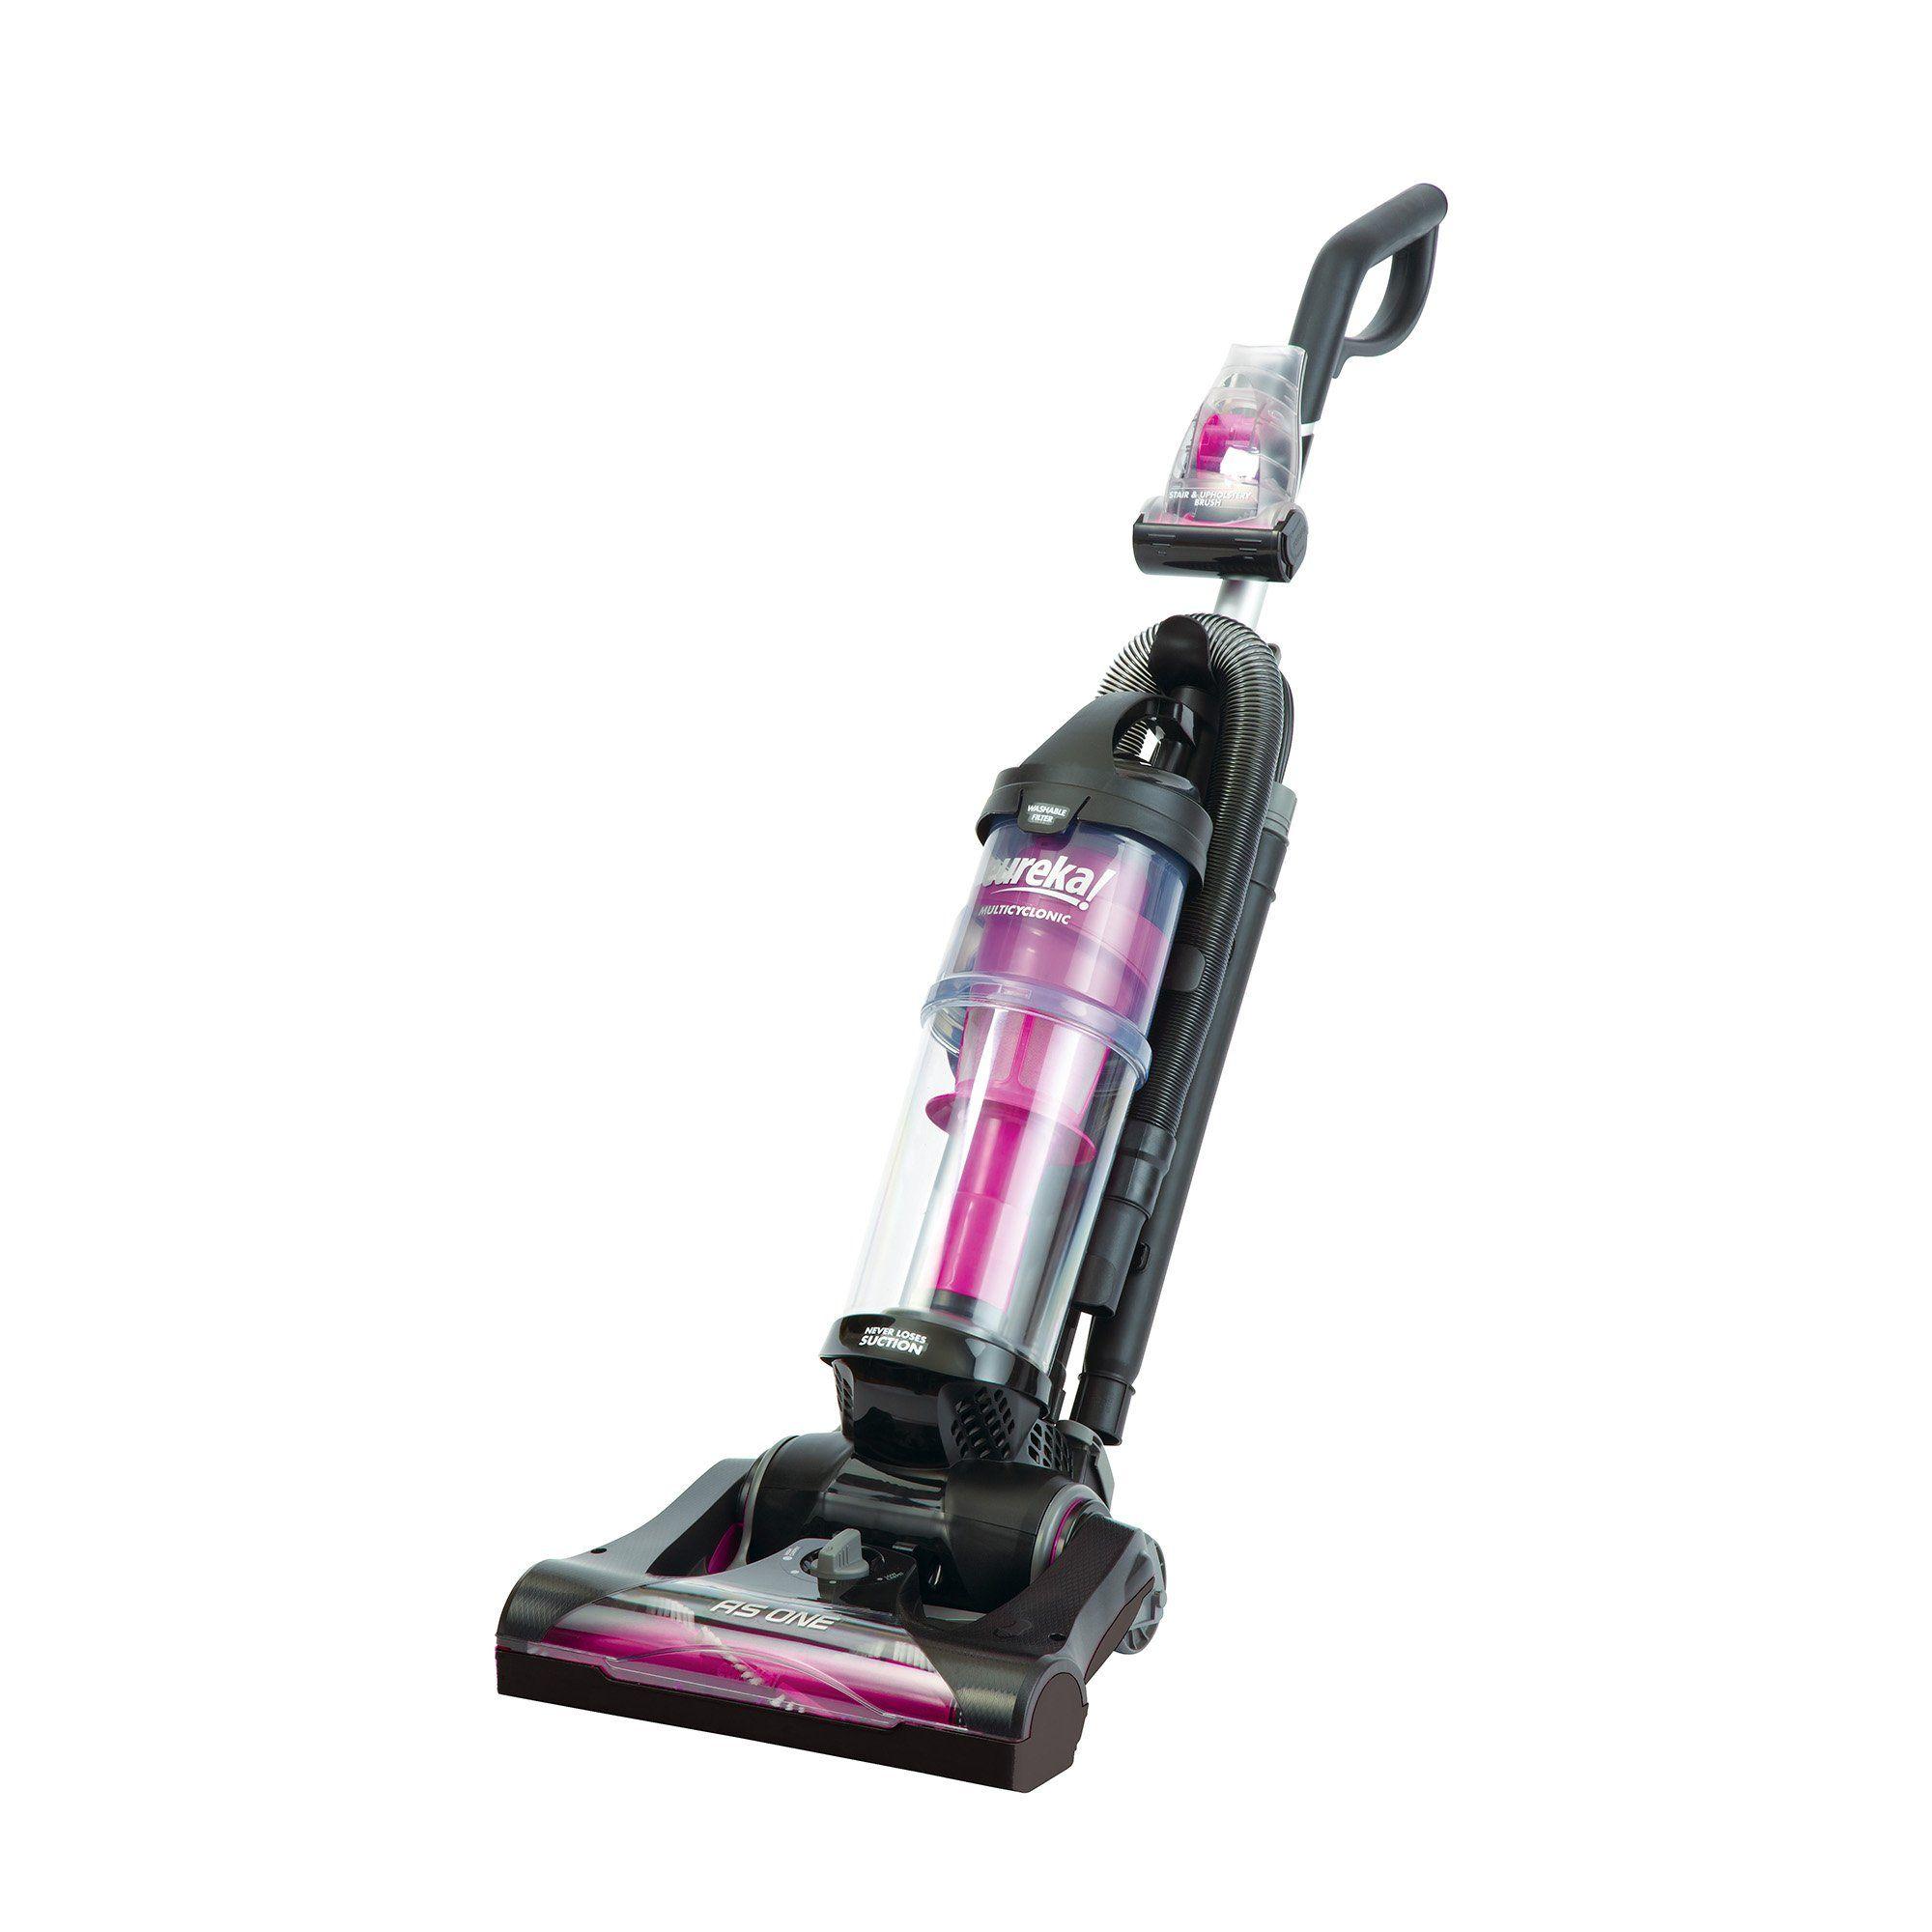 Best Vacuum Cleaner For Pet Hair 2020 Buying Guide And Reviews With Images Best Vacuum Vacuum Cleaner Vacuum Cleaner Repair